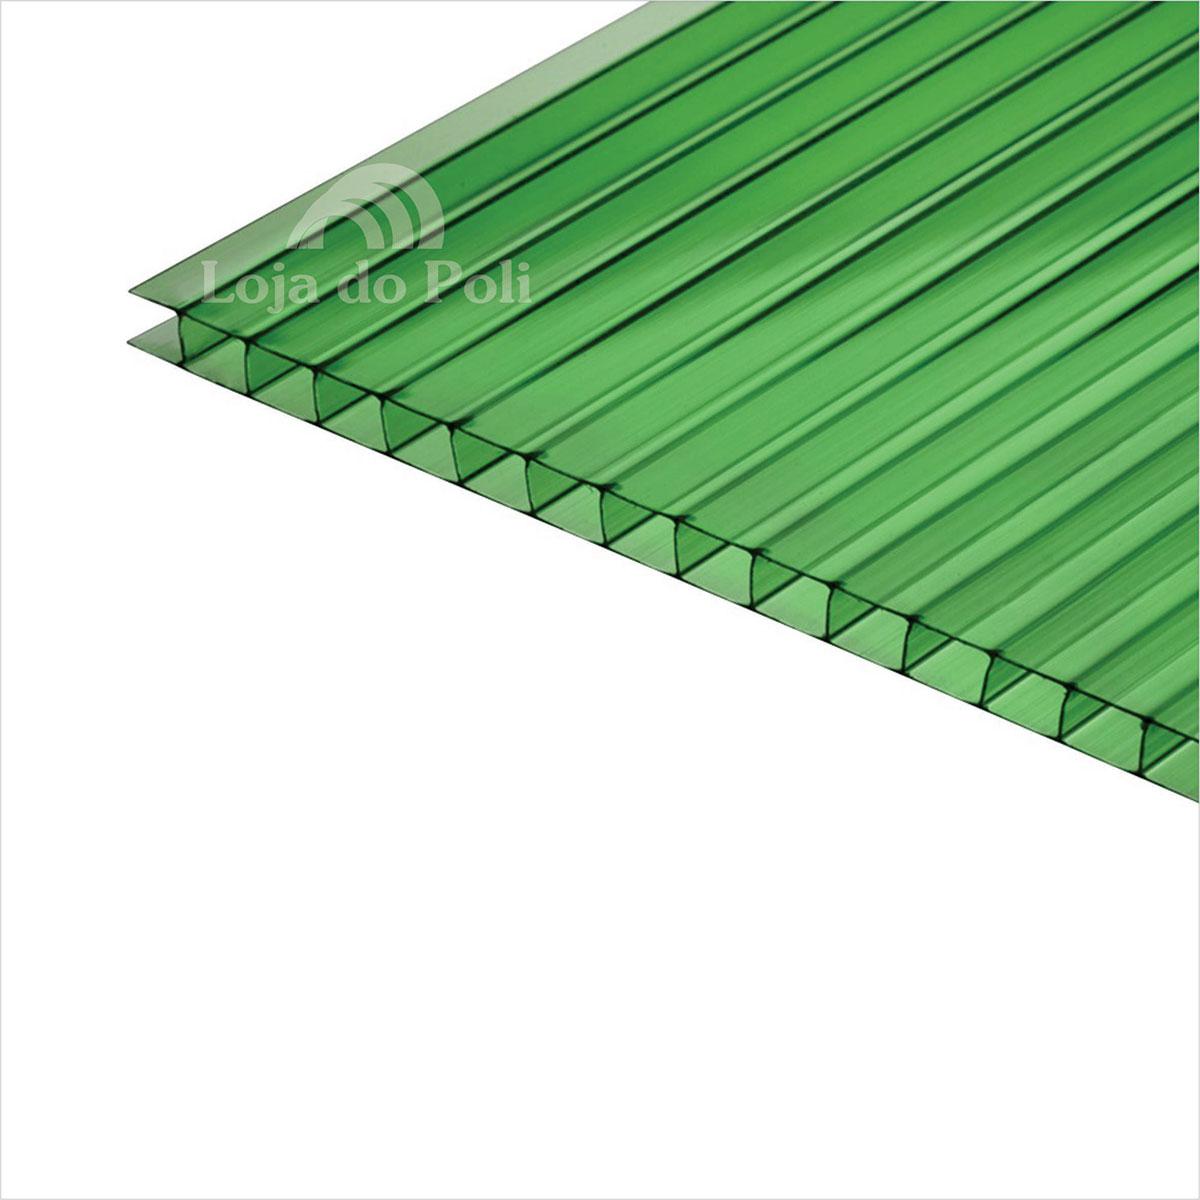 Chapa Policarbonato Alveolar Verde 6mm 2,1x6,0m